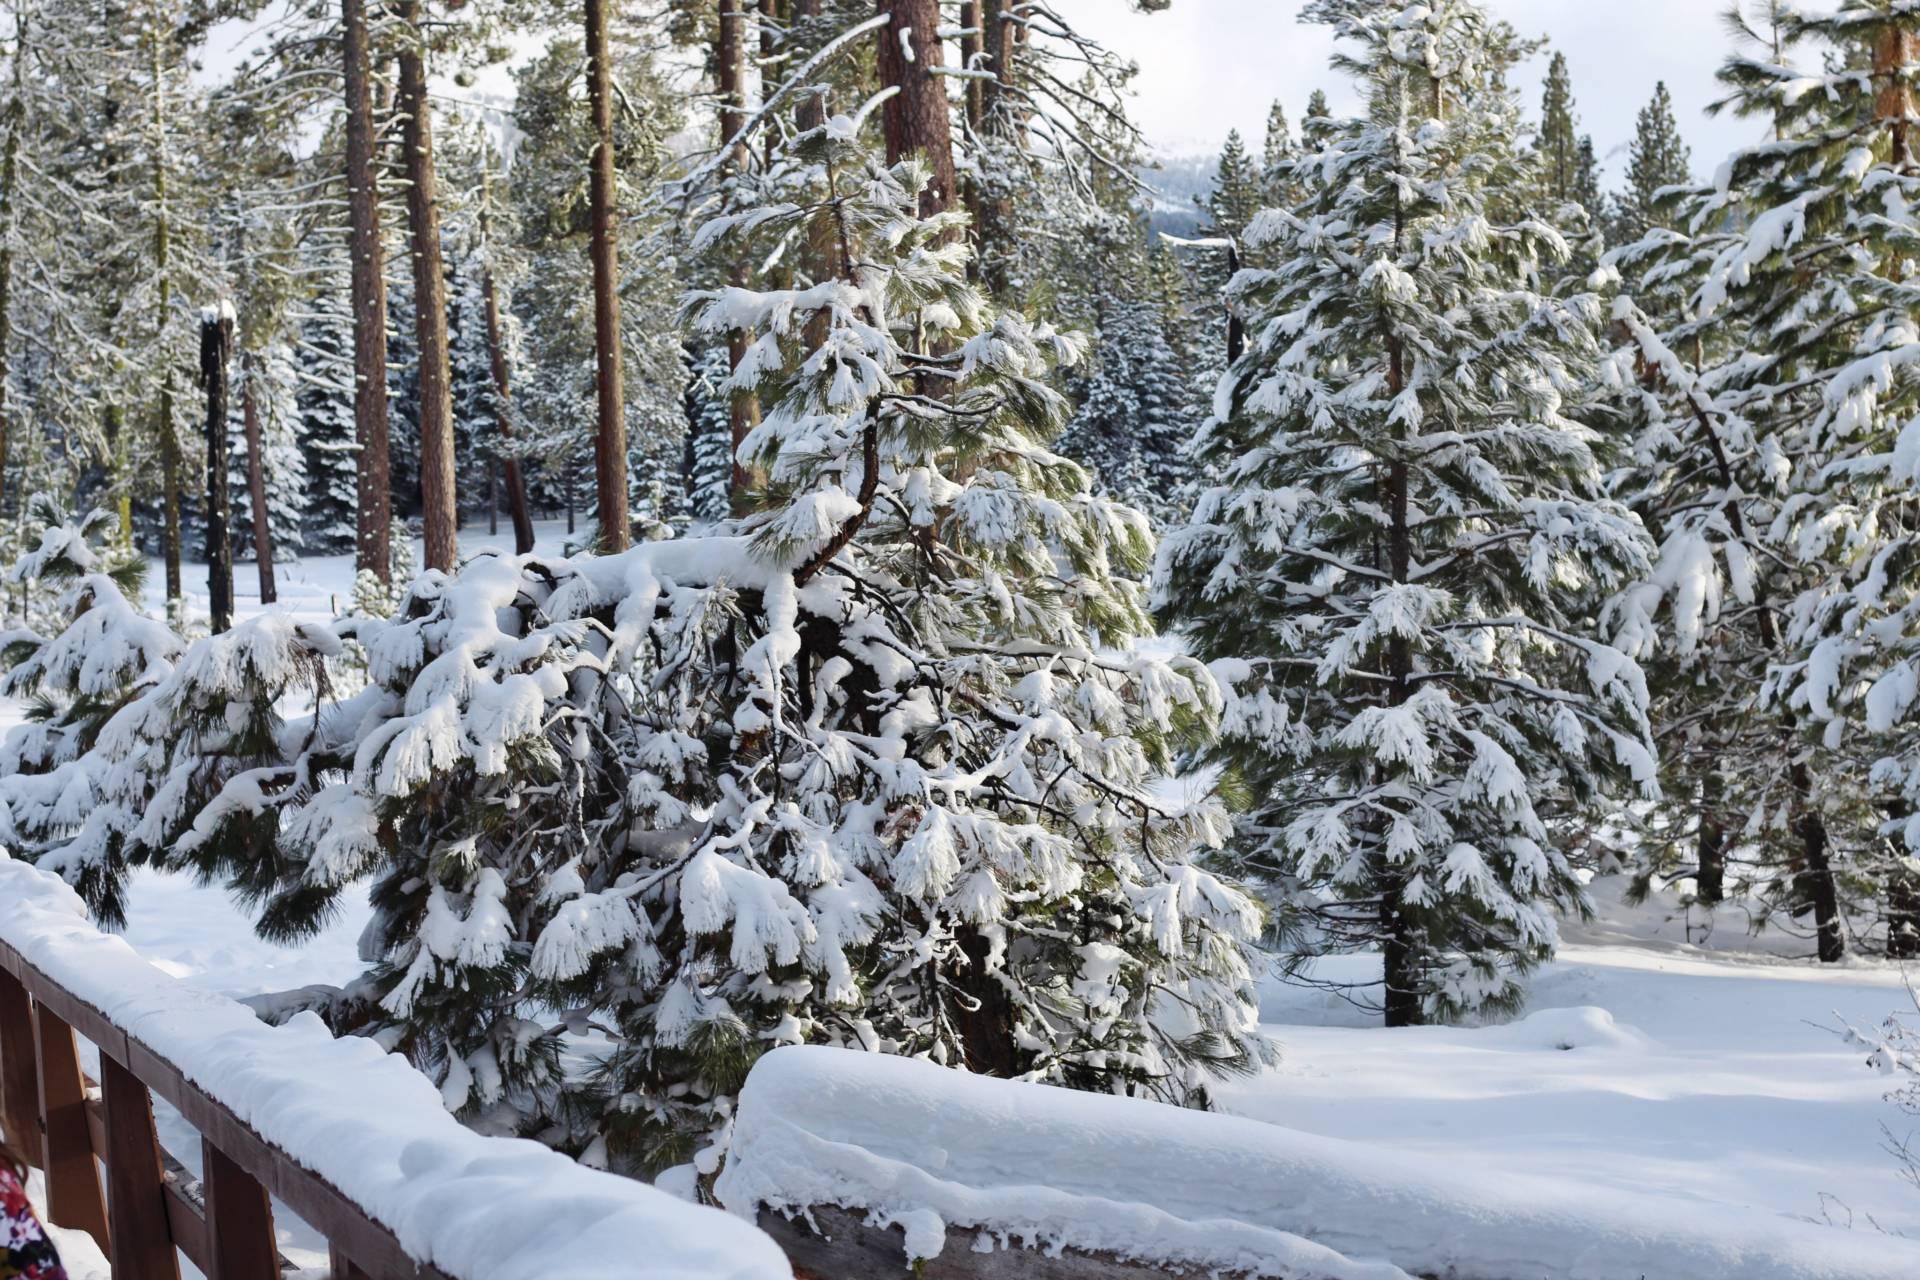 Snow lassen park